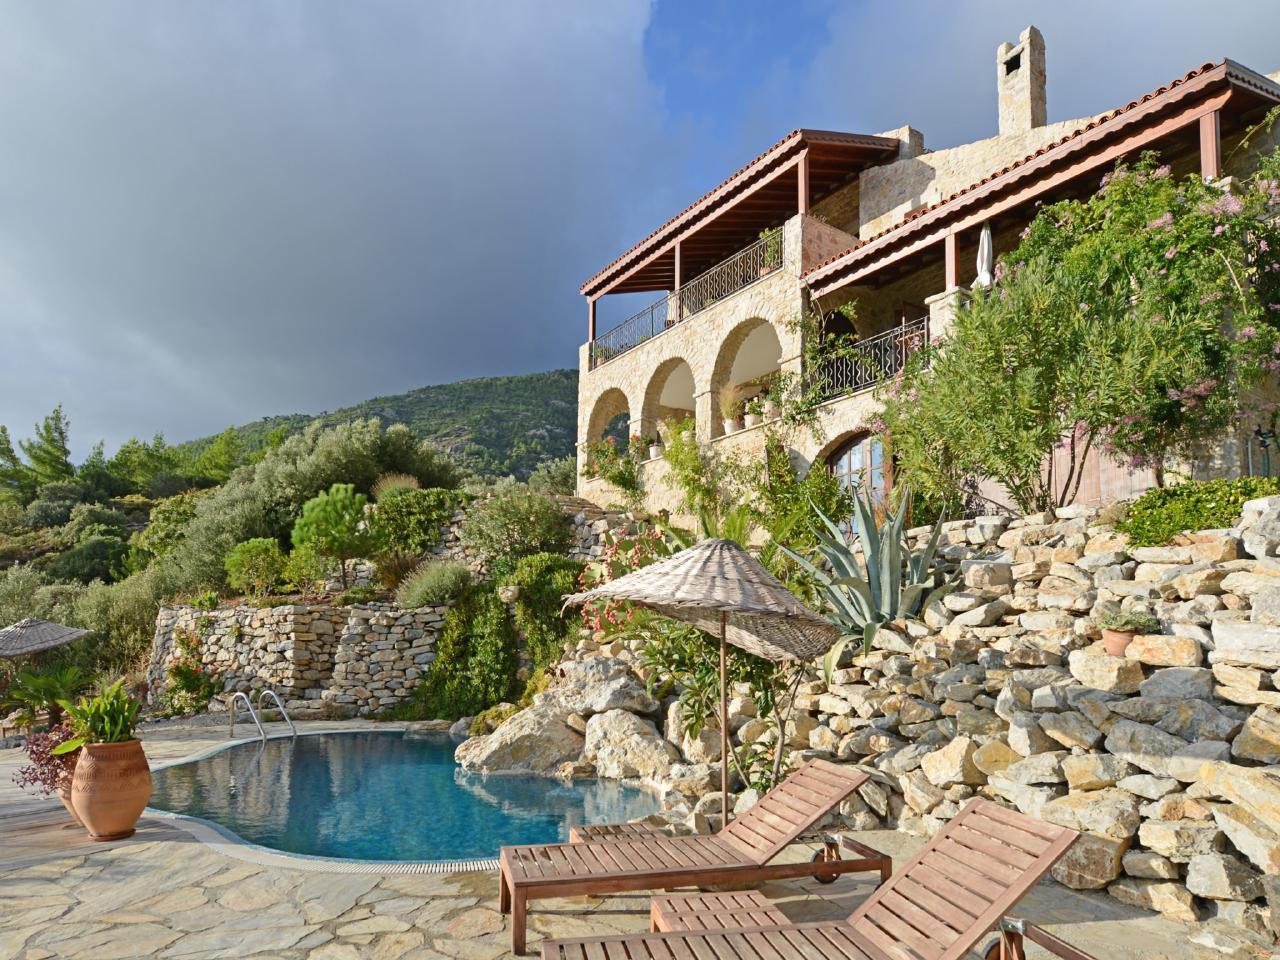 Maison de vacances Exklusives Chalet, romantisch am Berghang und Meer gelegen (2506674), Mesudiye, , Région Egéenne, Turquie, image 1